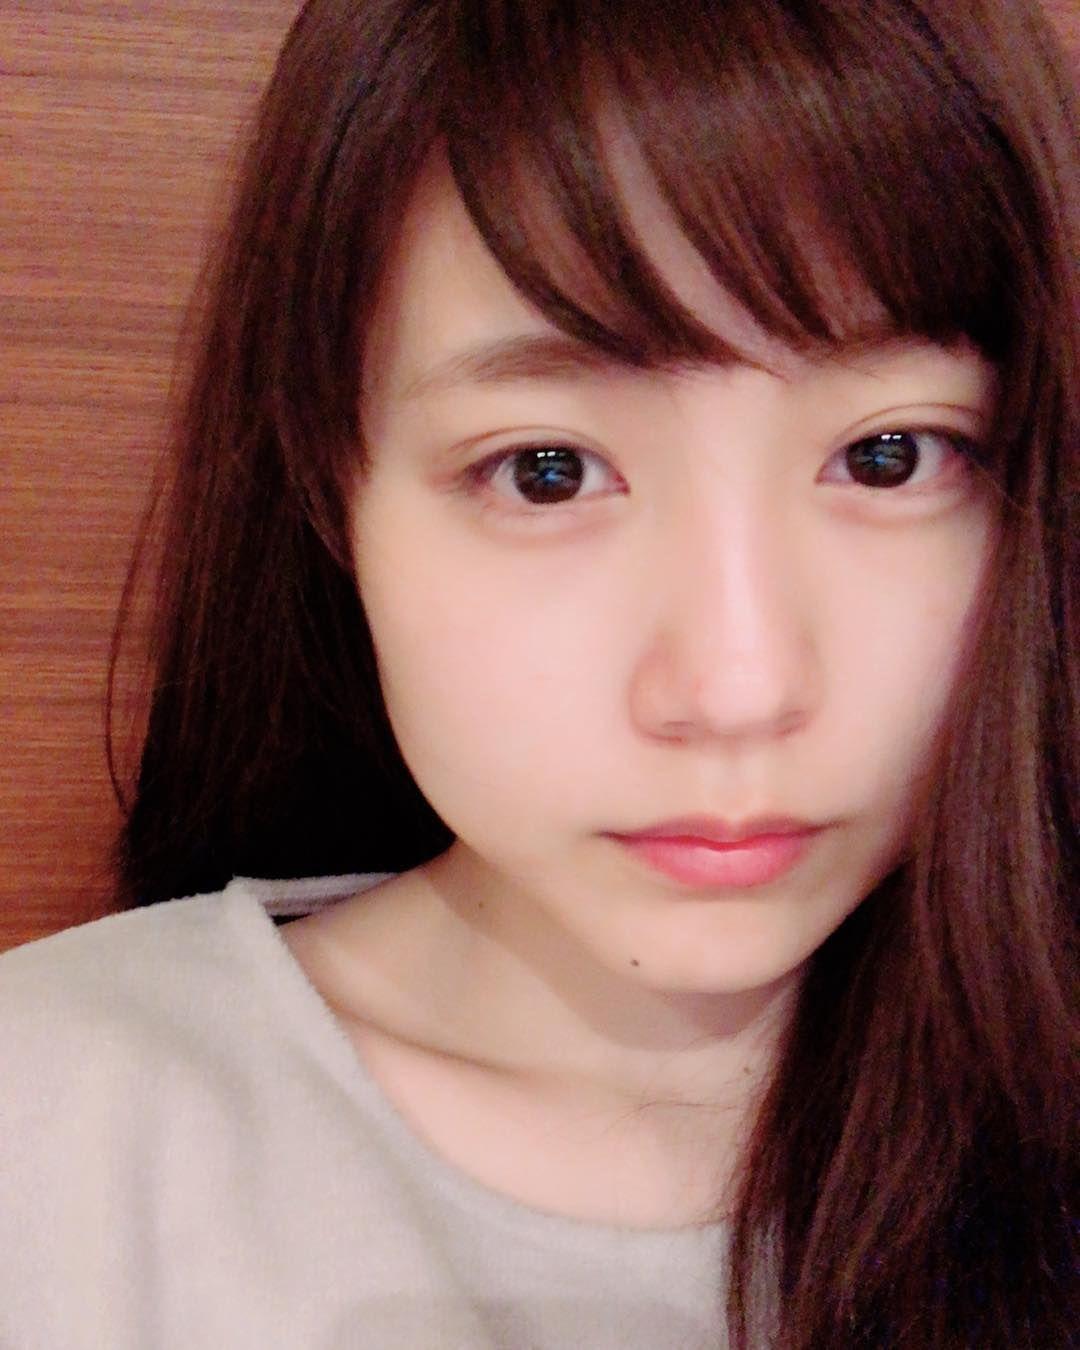 kasumi arimura メイクアップ いいね!19.4千件、コメント326件 ― kasumi arimura 有村架